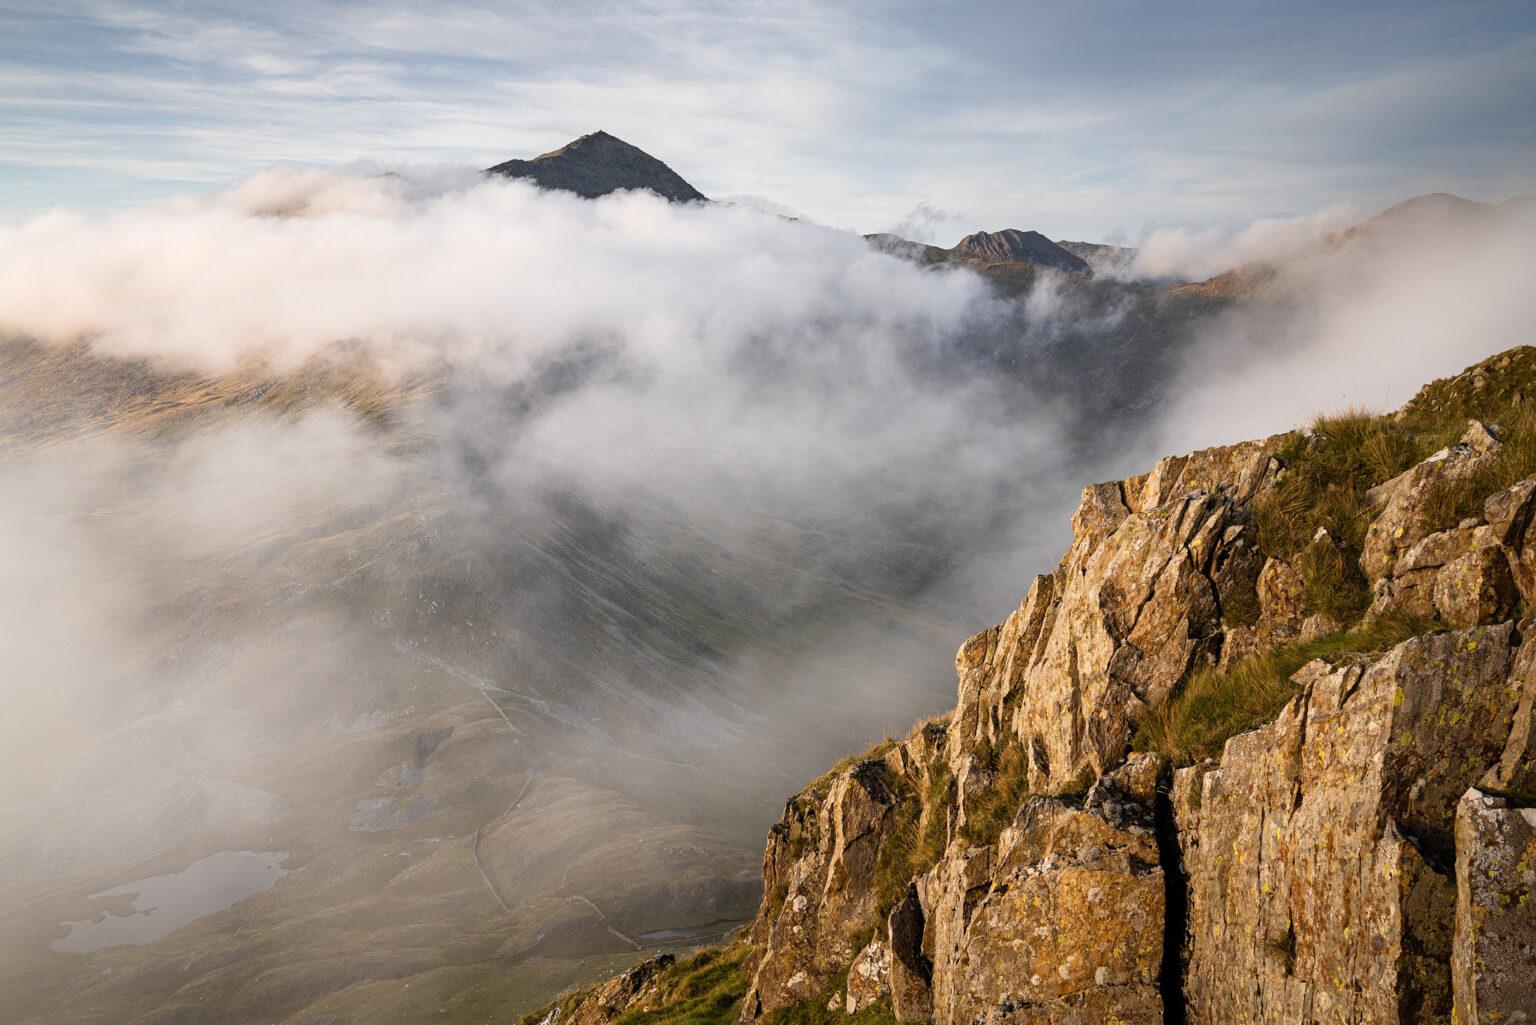 Yr Aran Sunset Looking Towards Snowdon - Snowdonia Landscape Photography